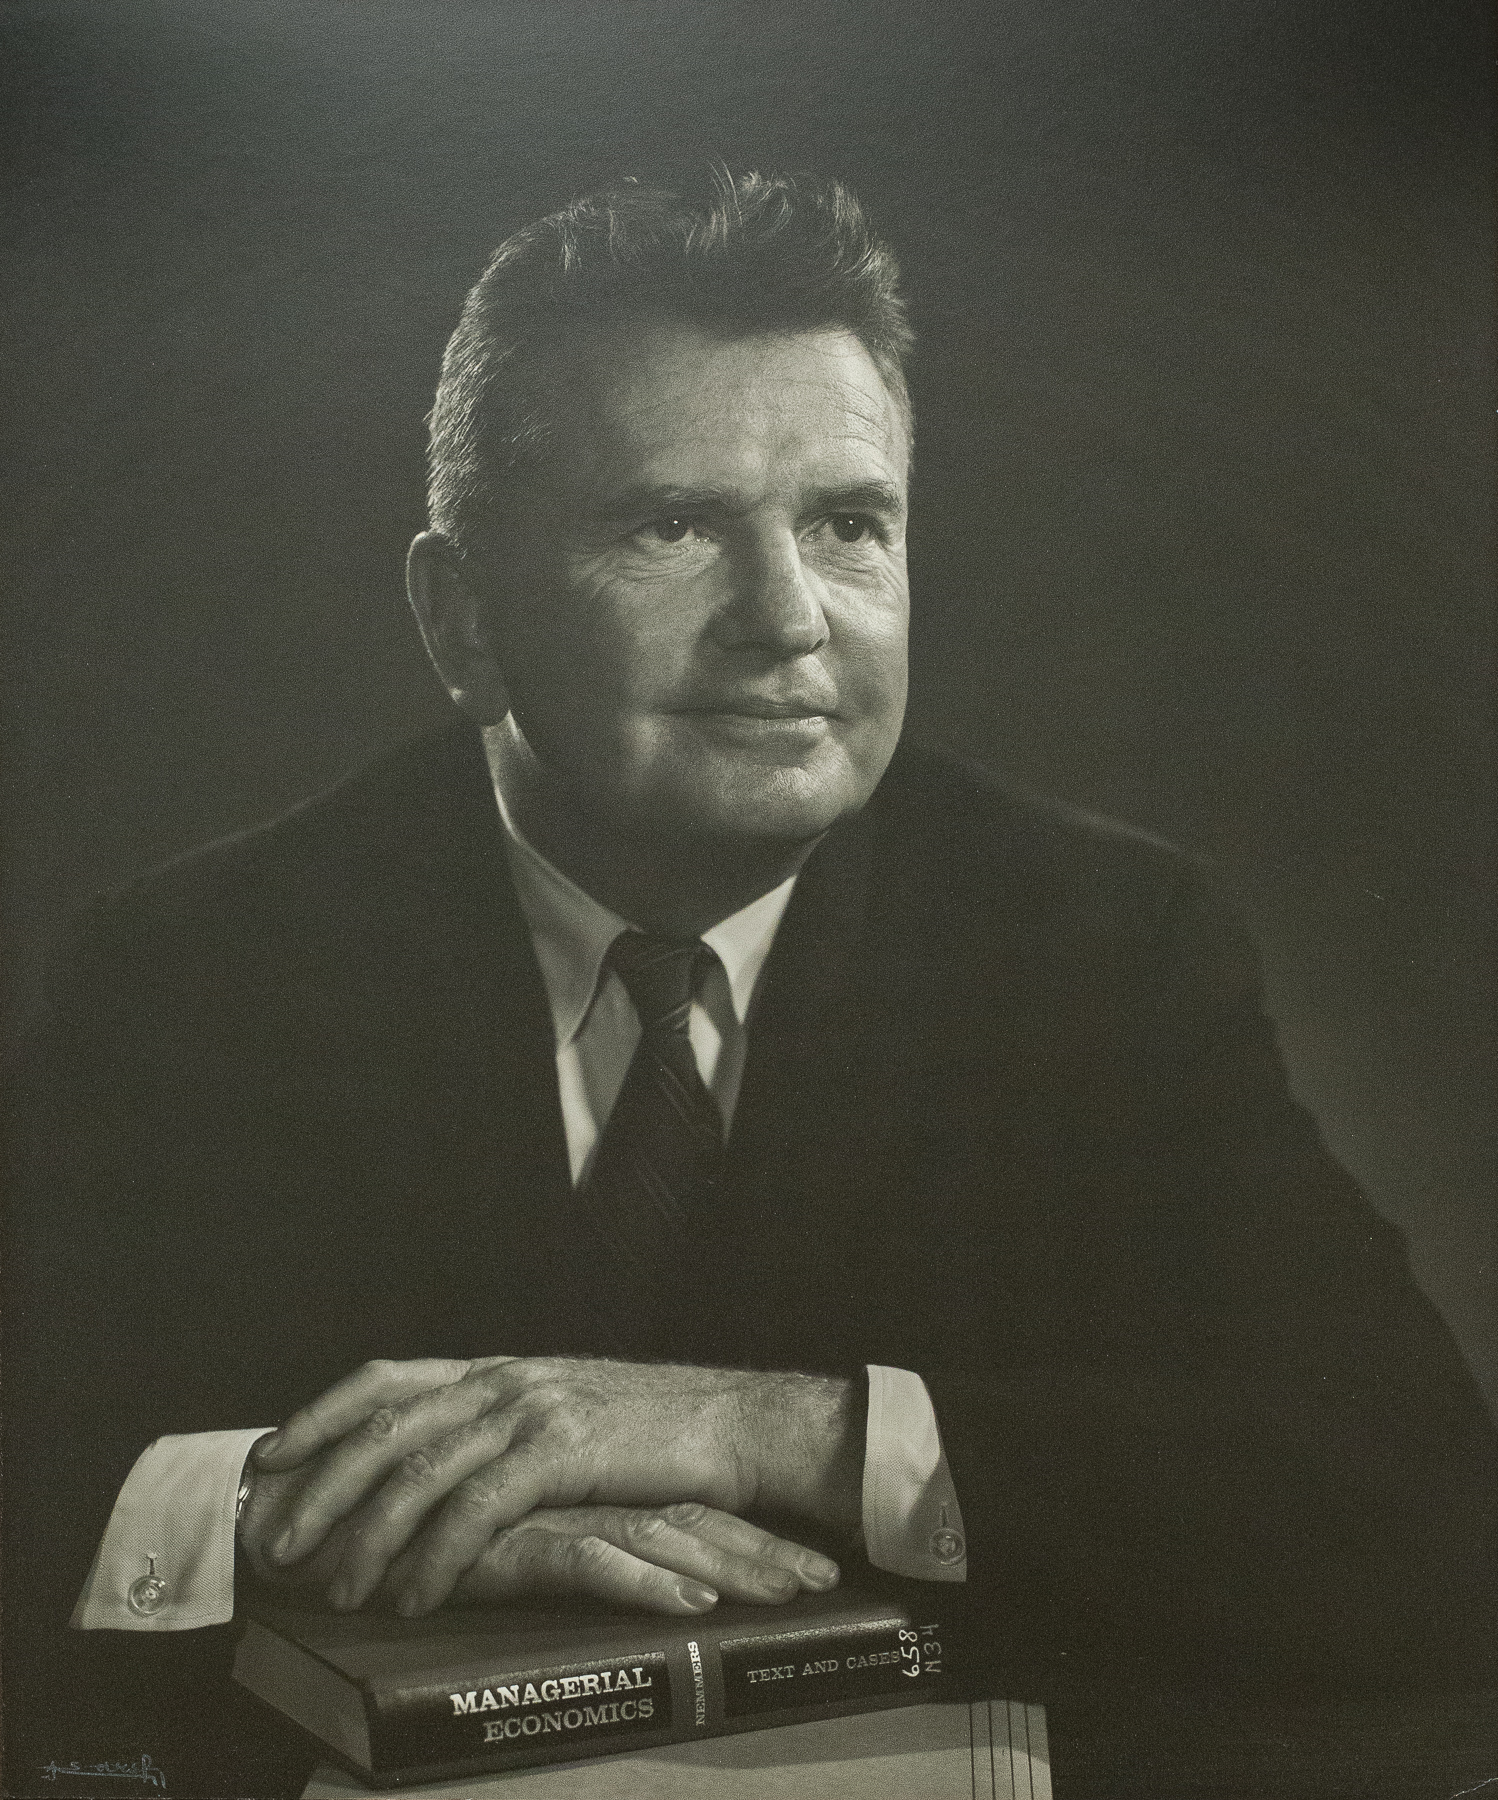 Laurence J. Ackerman. Dean 1941-1963.